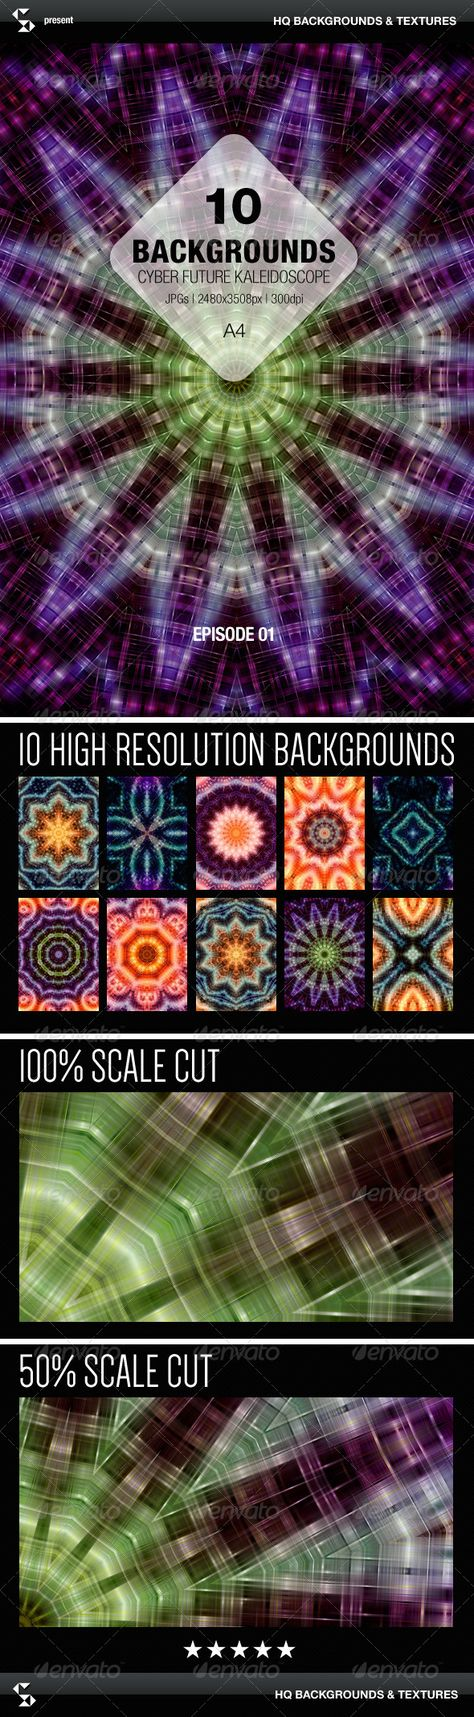 Cyber Future Kaleidoscope Backgrounds - Episode 01